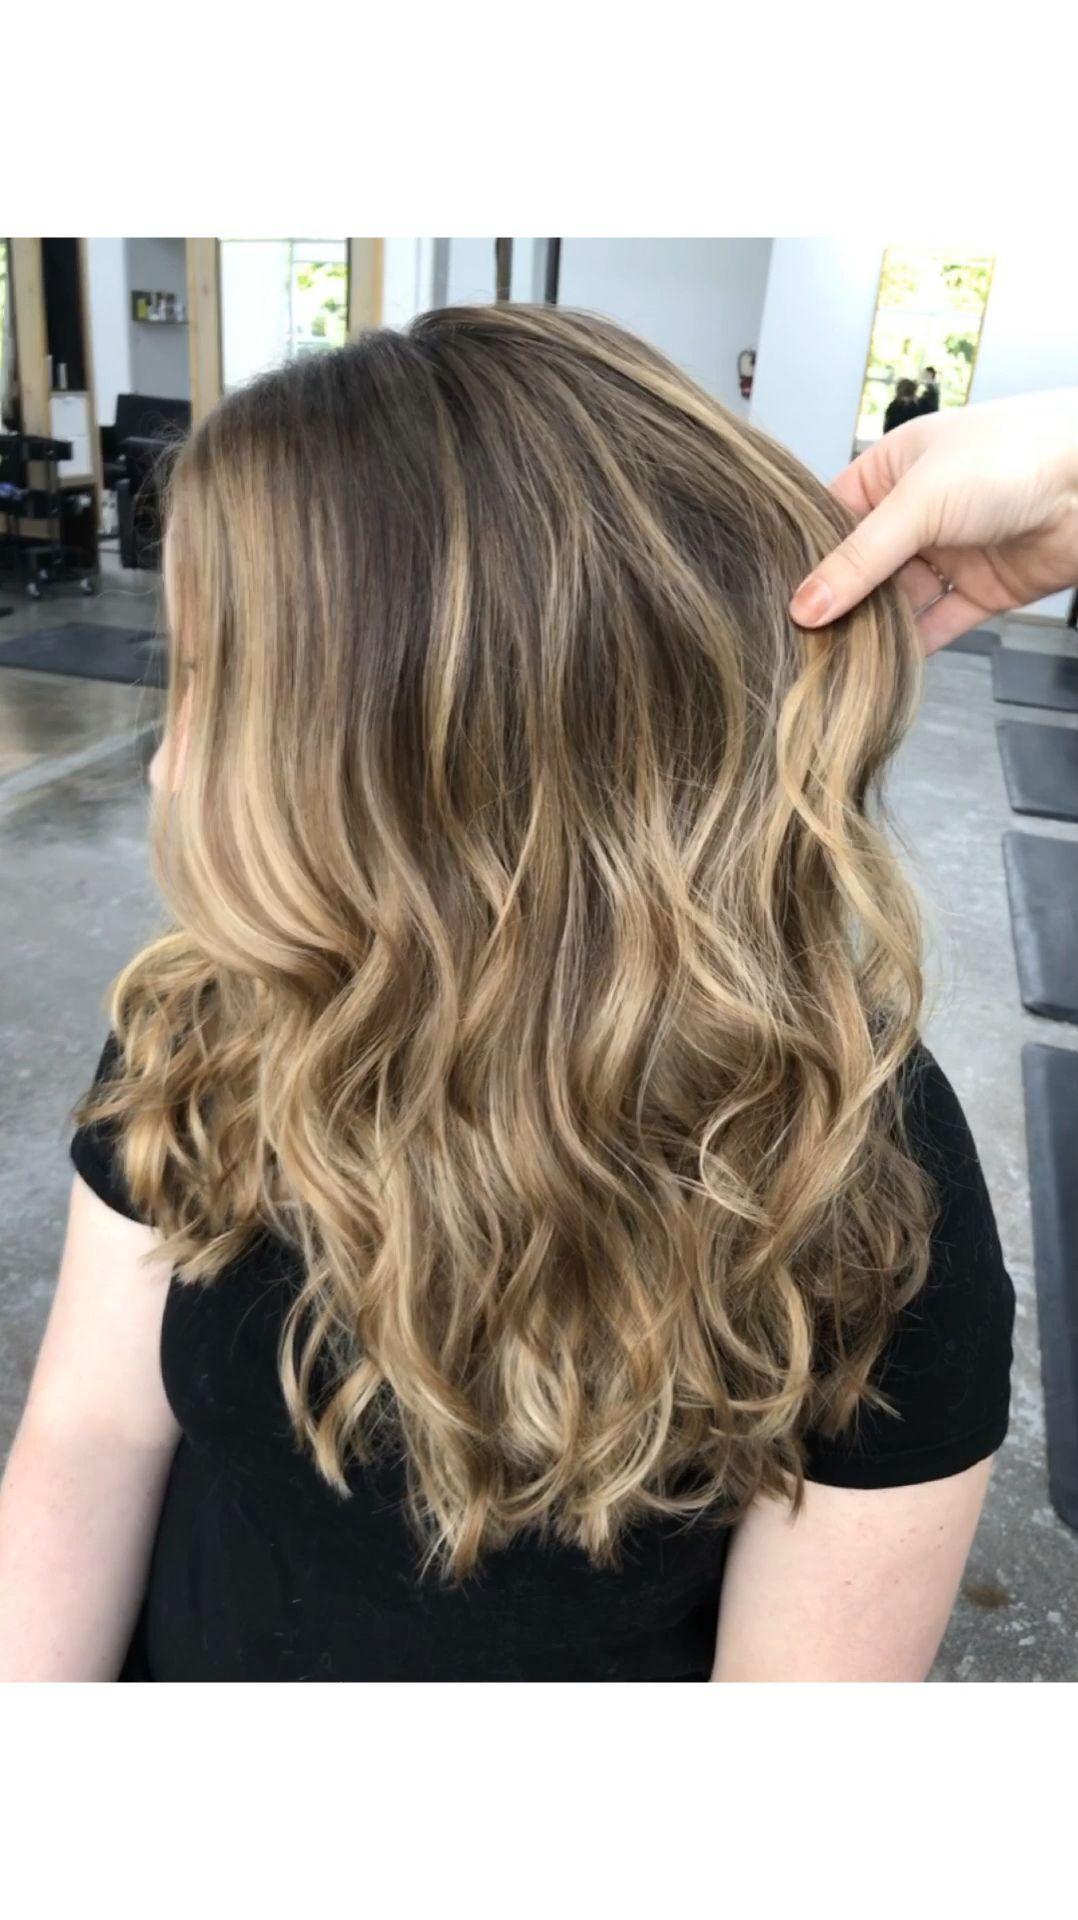 Beautiful hair -  @Jessramseyhair #dallas #dallasbalayage #bishoparts